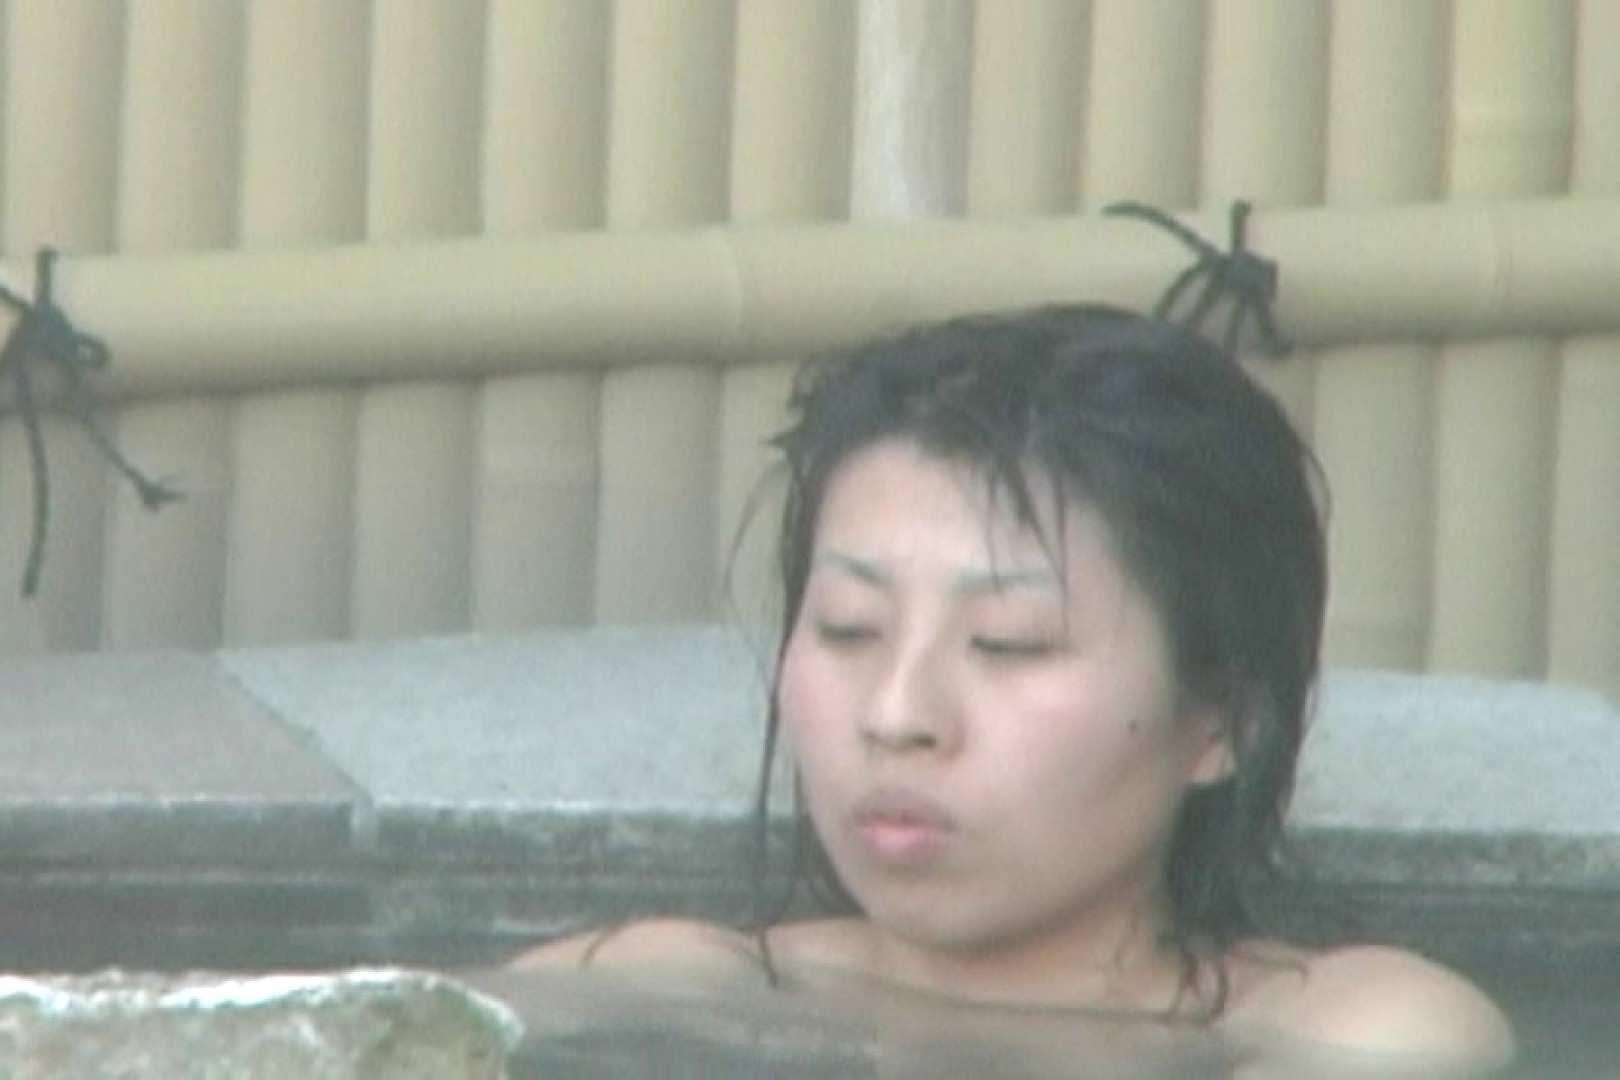 Aquaな露天風呂Vol.589 0  74連発 34